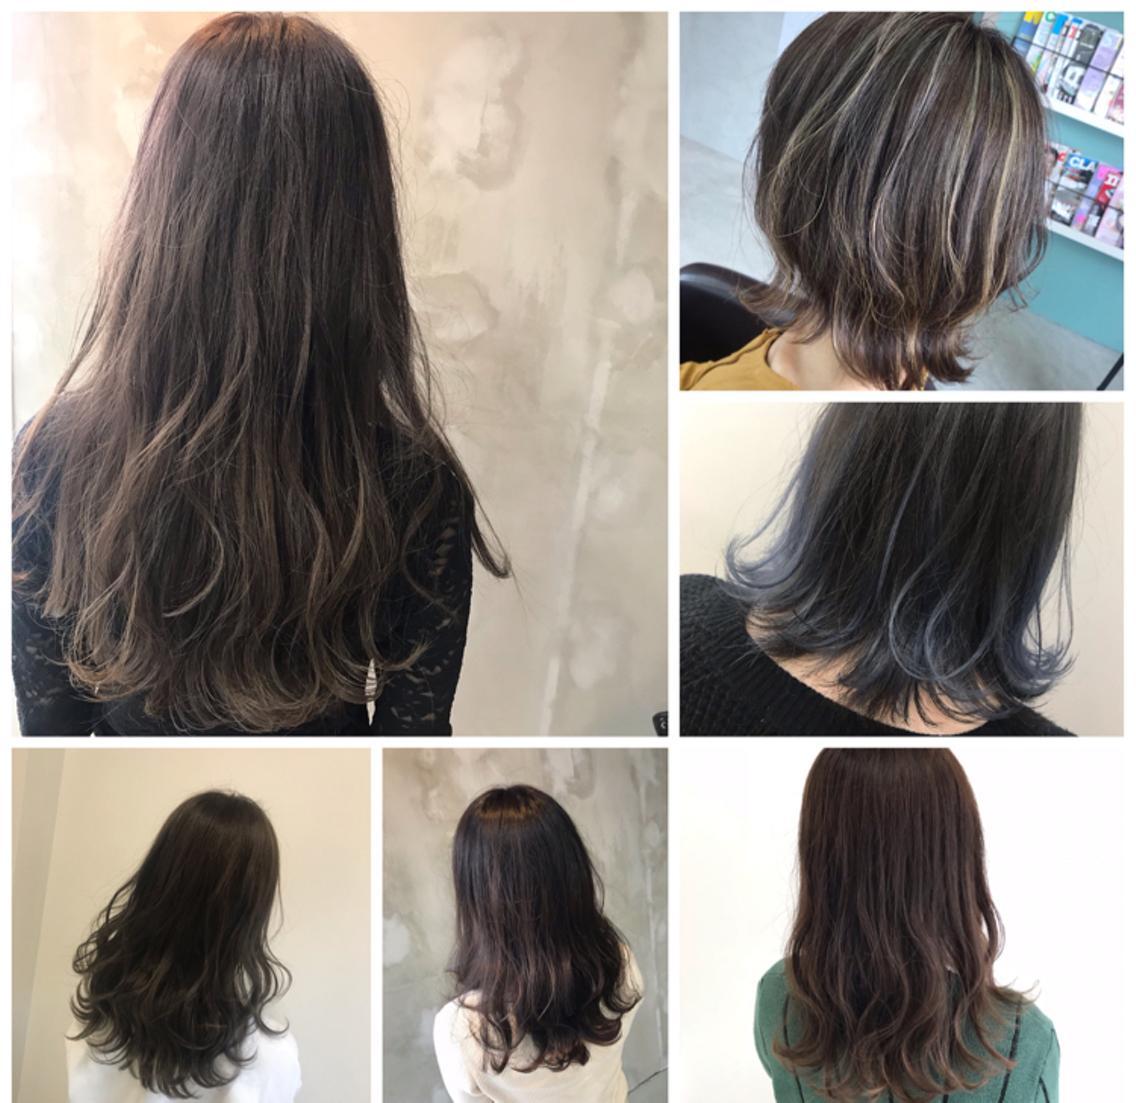 cuore hair(クオレヘアー)布施店所属・東大貴の掲載